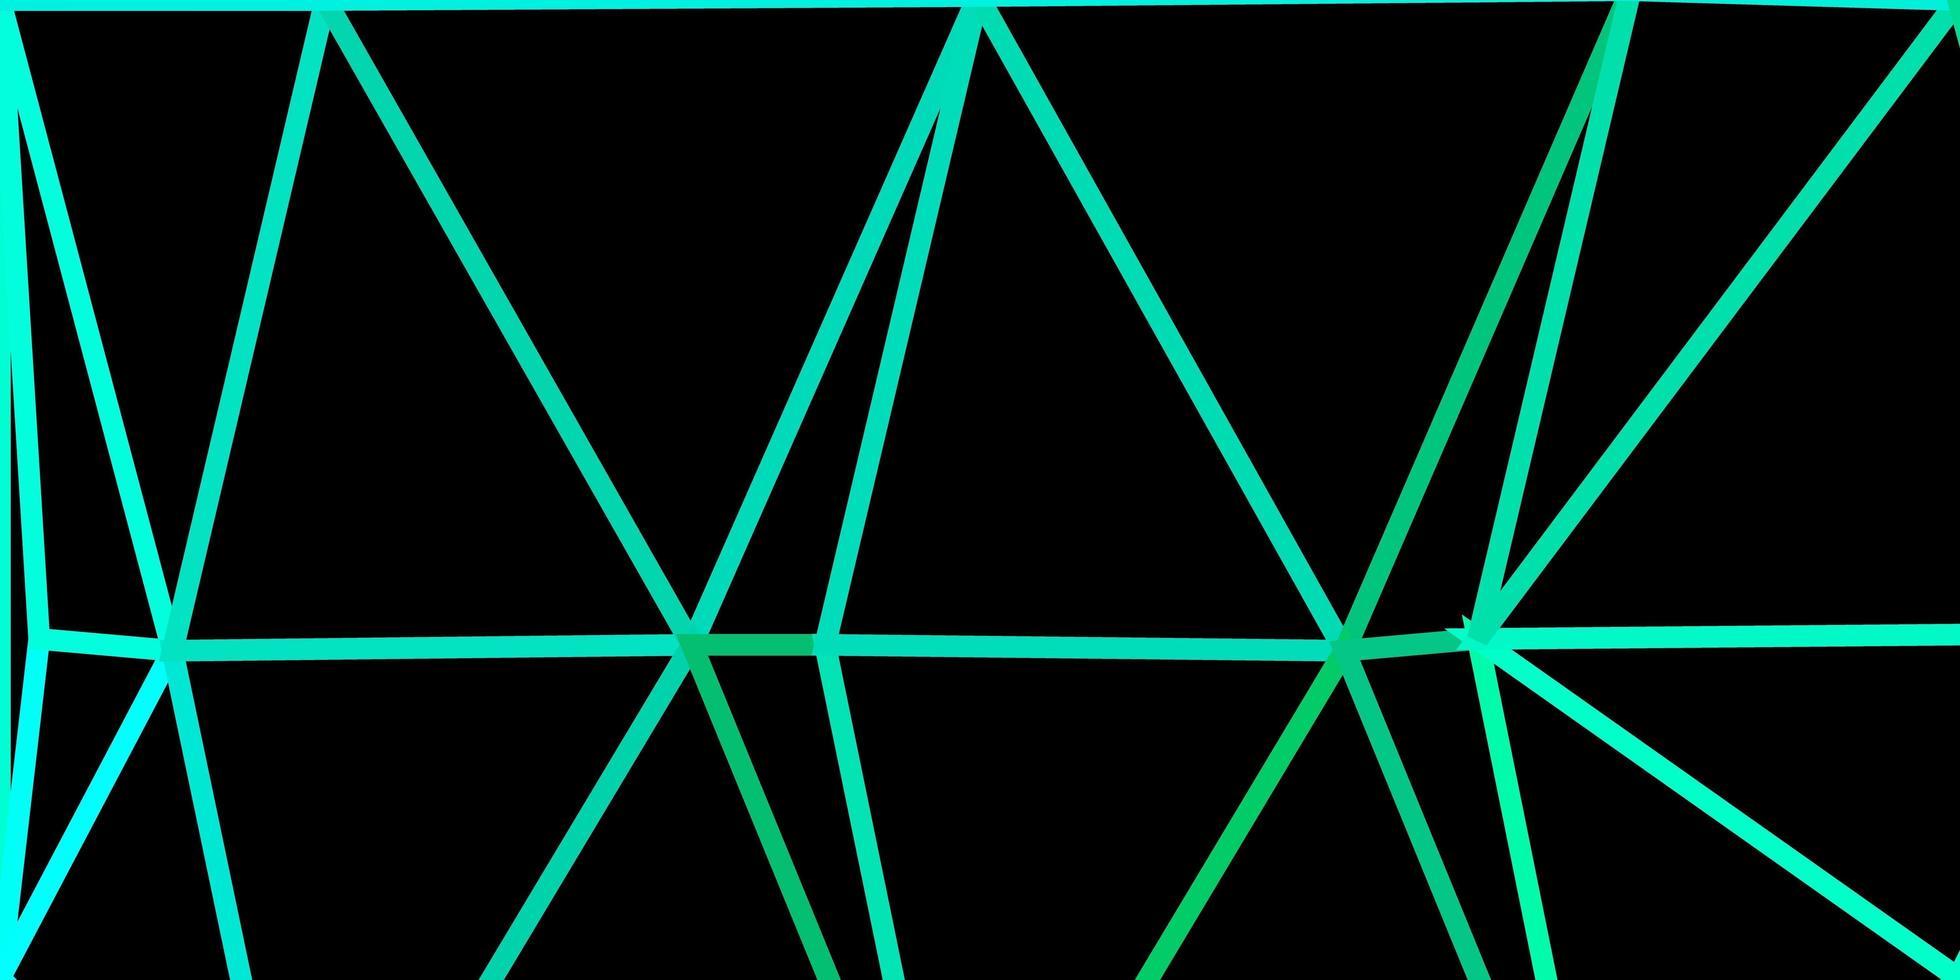 disposition de triangle poly vecteur vert clair.